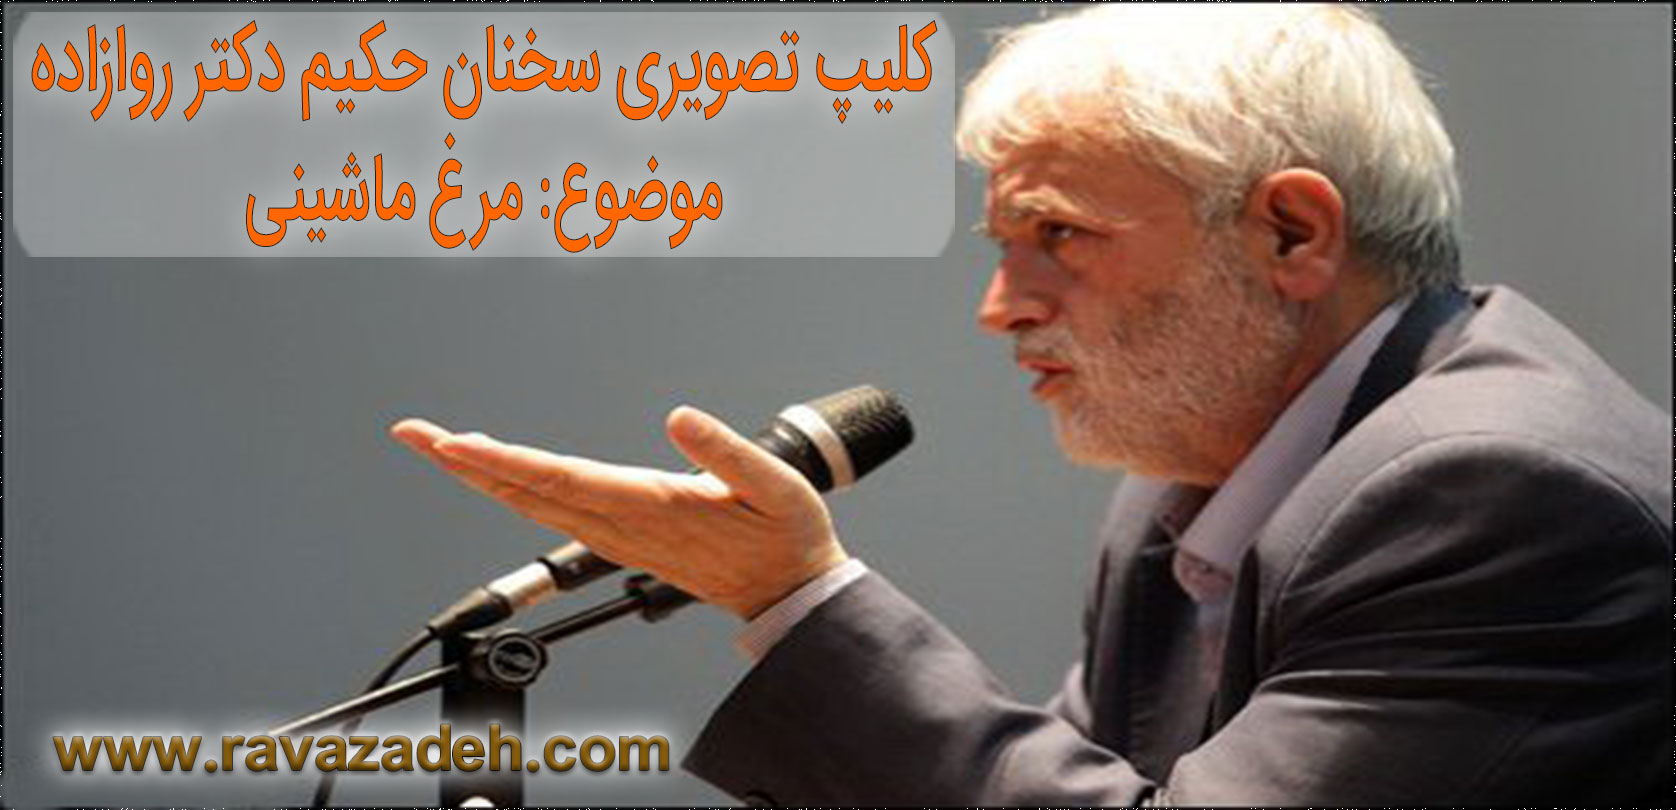 Photo of مرغ ماشینی + کلیپ تصویری سخنرانی حکیم دکتر روازاده